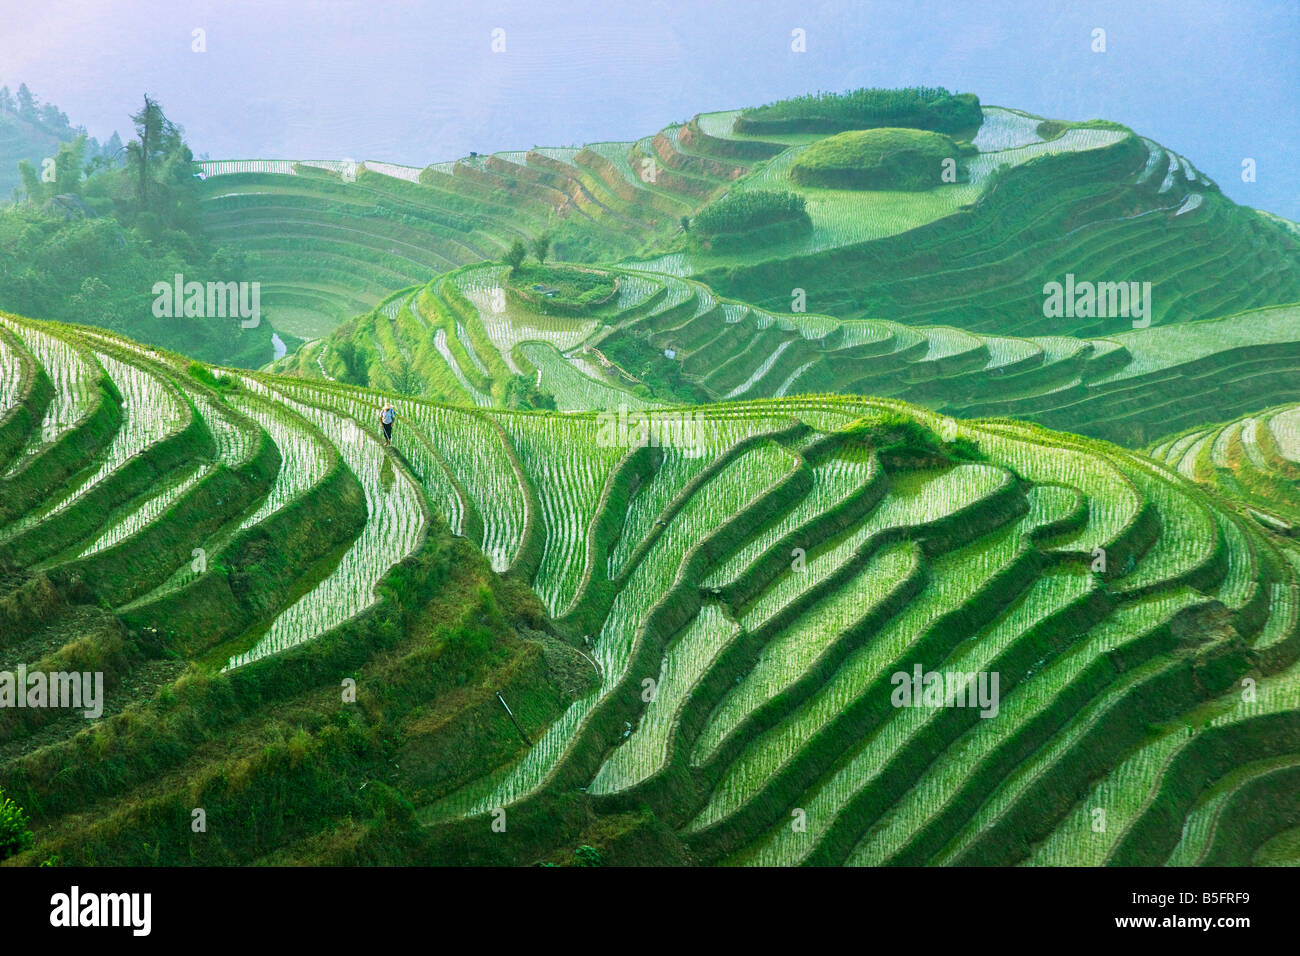 Landschaft von Reis Terrassen Longsheng Guangxi China Stockfoto